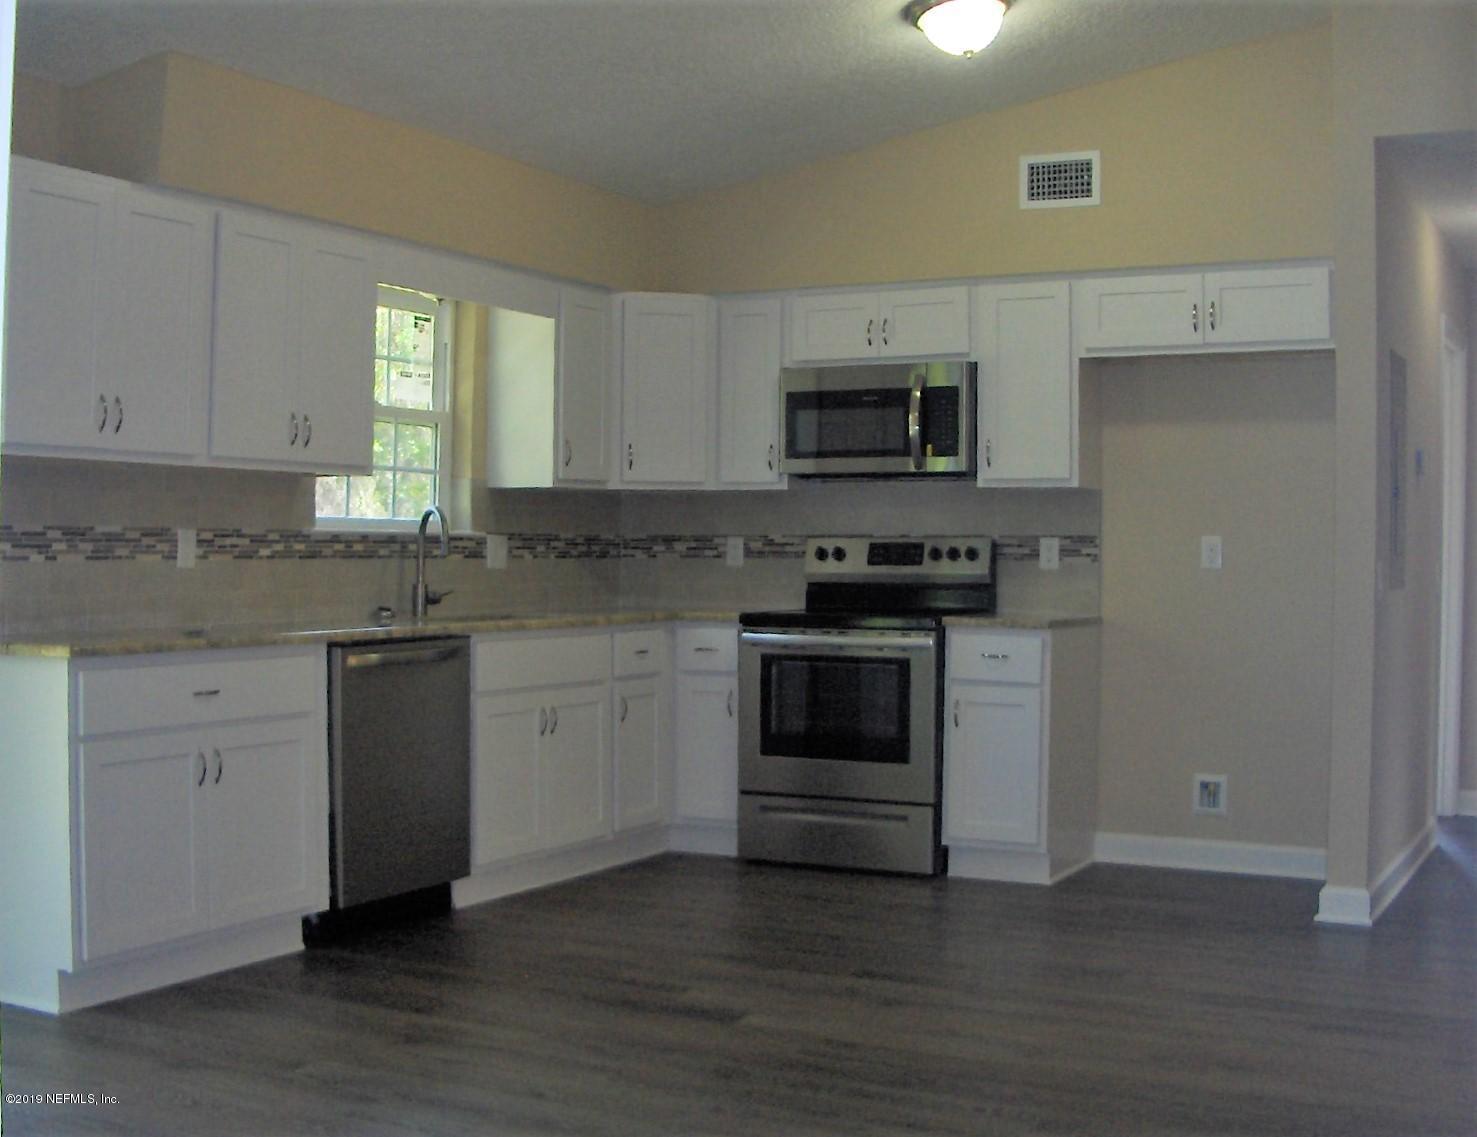 4122 APPALOOSA, MIDDLEBURG, FLORIDA 32068, 3 Bedrooms Bedrooms, ,2 BathroomsBathrooms,Residential - single family,For sale,APPALOOSA,970535